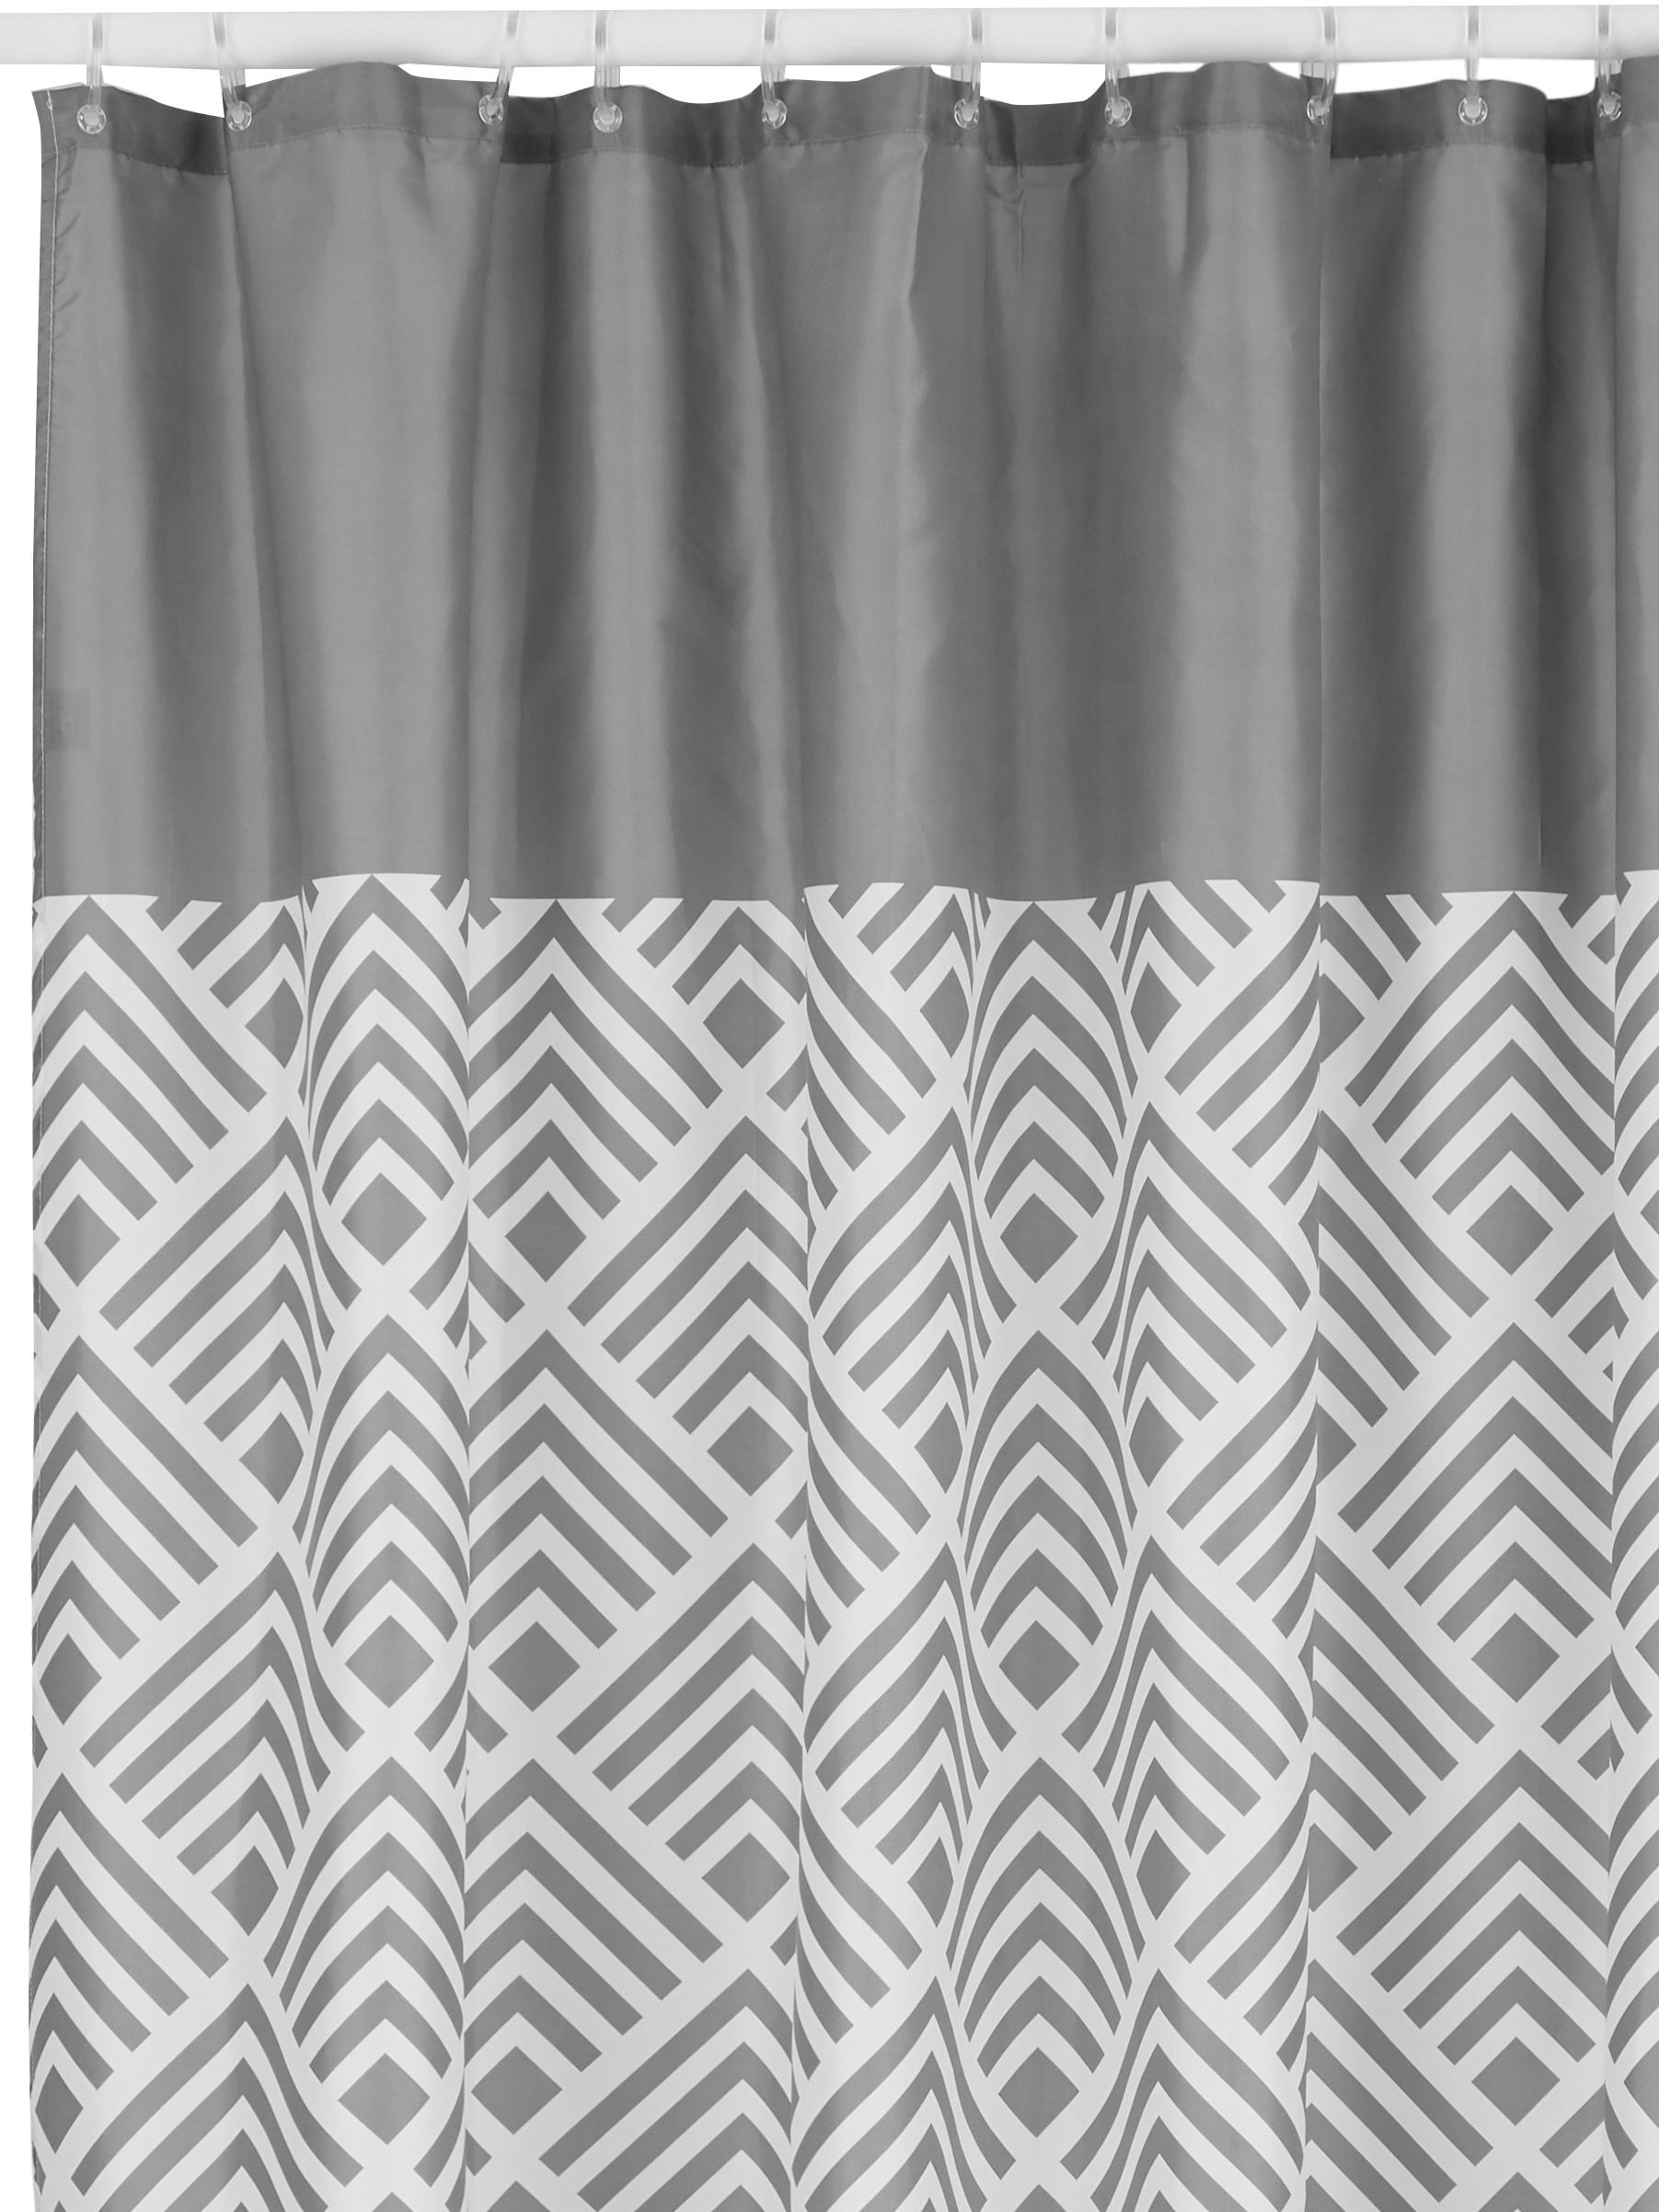 Cortina de baño Allie, Ojales: metal, Gris, blanco, An 180 x L 200 cm